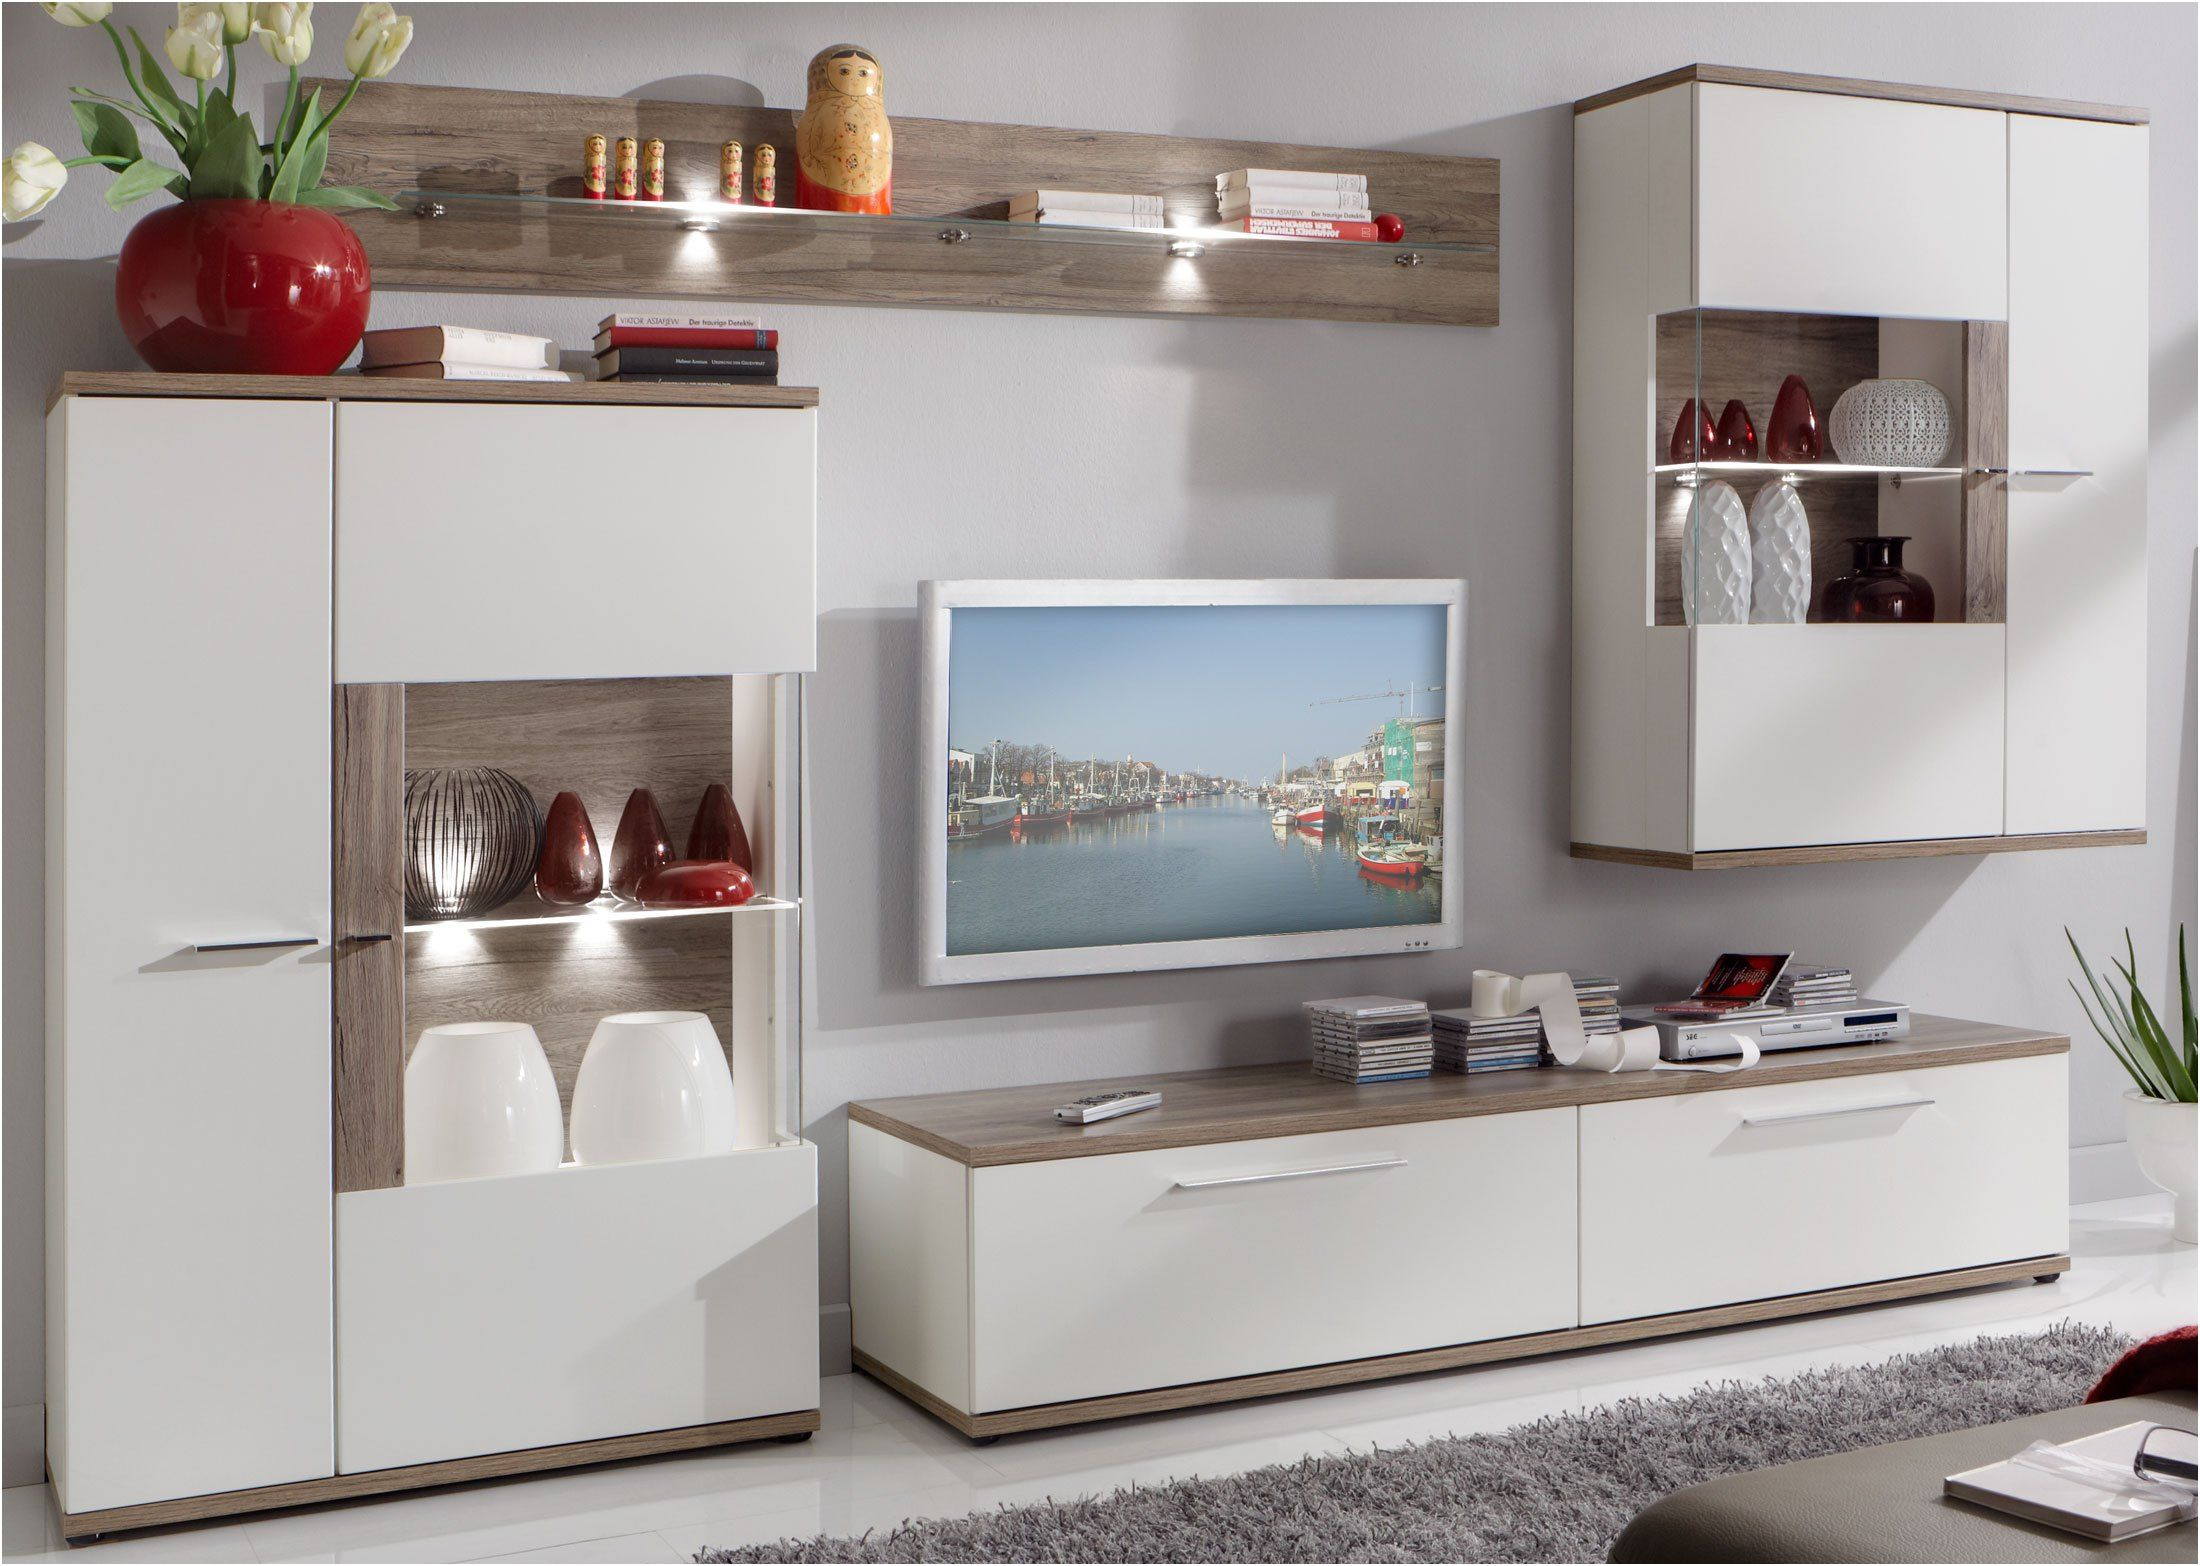 Lieblingsstuck Wohnzimmer Anbauwand In 2020 Anbauwand Wohnzimmer